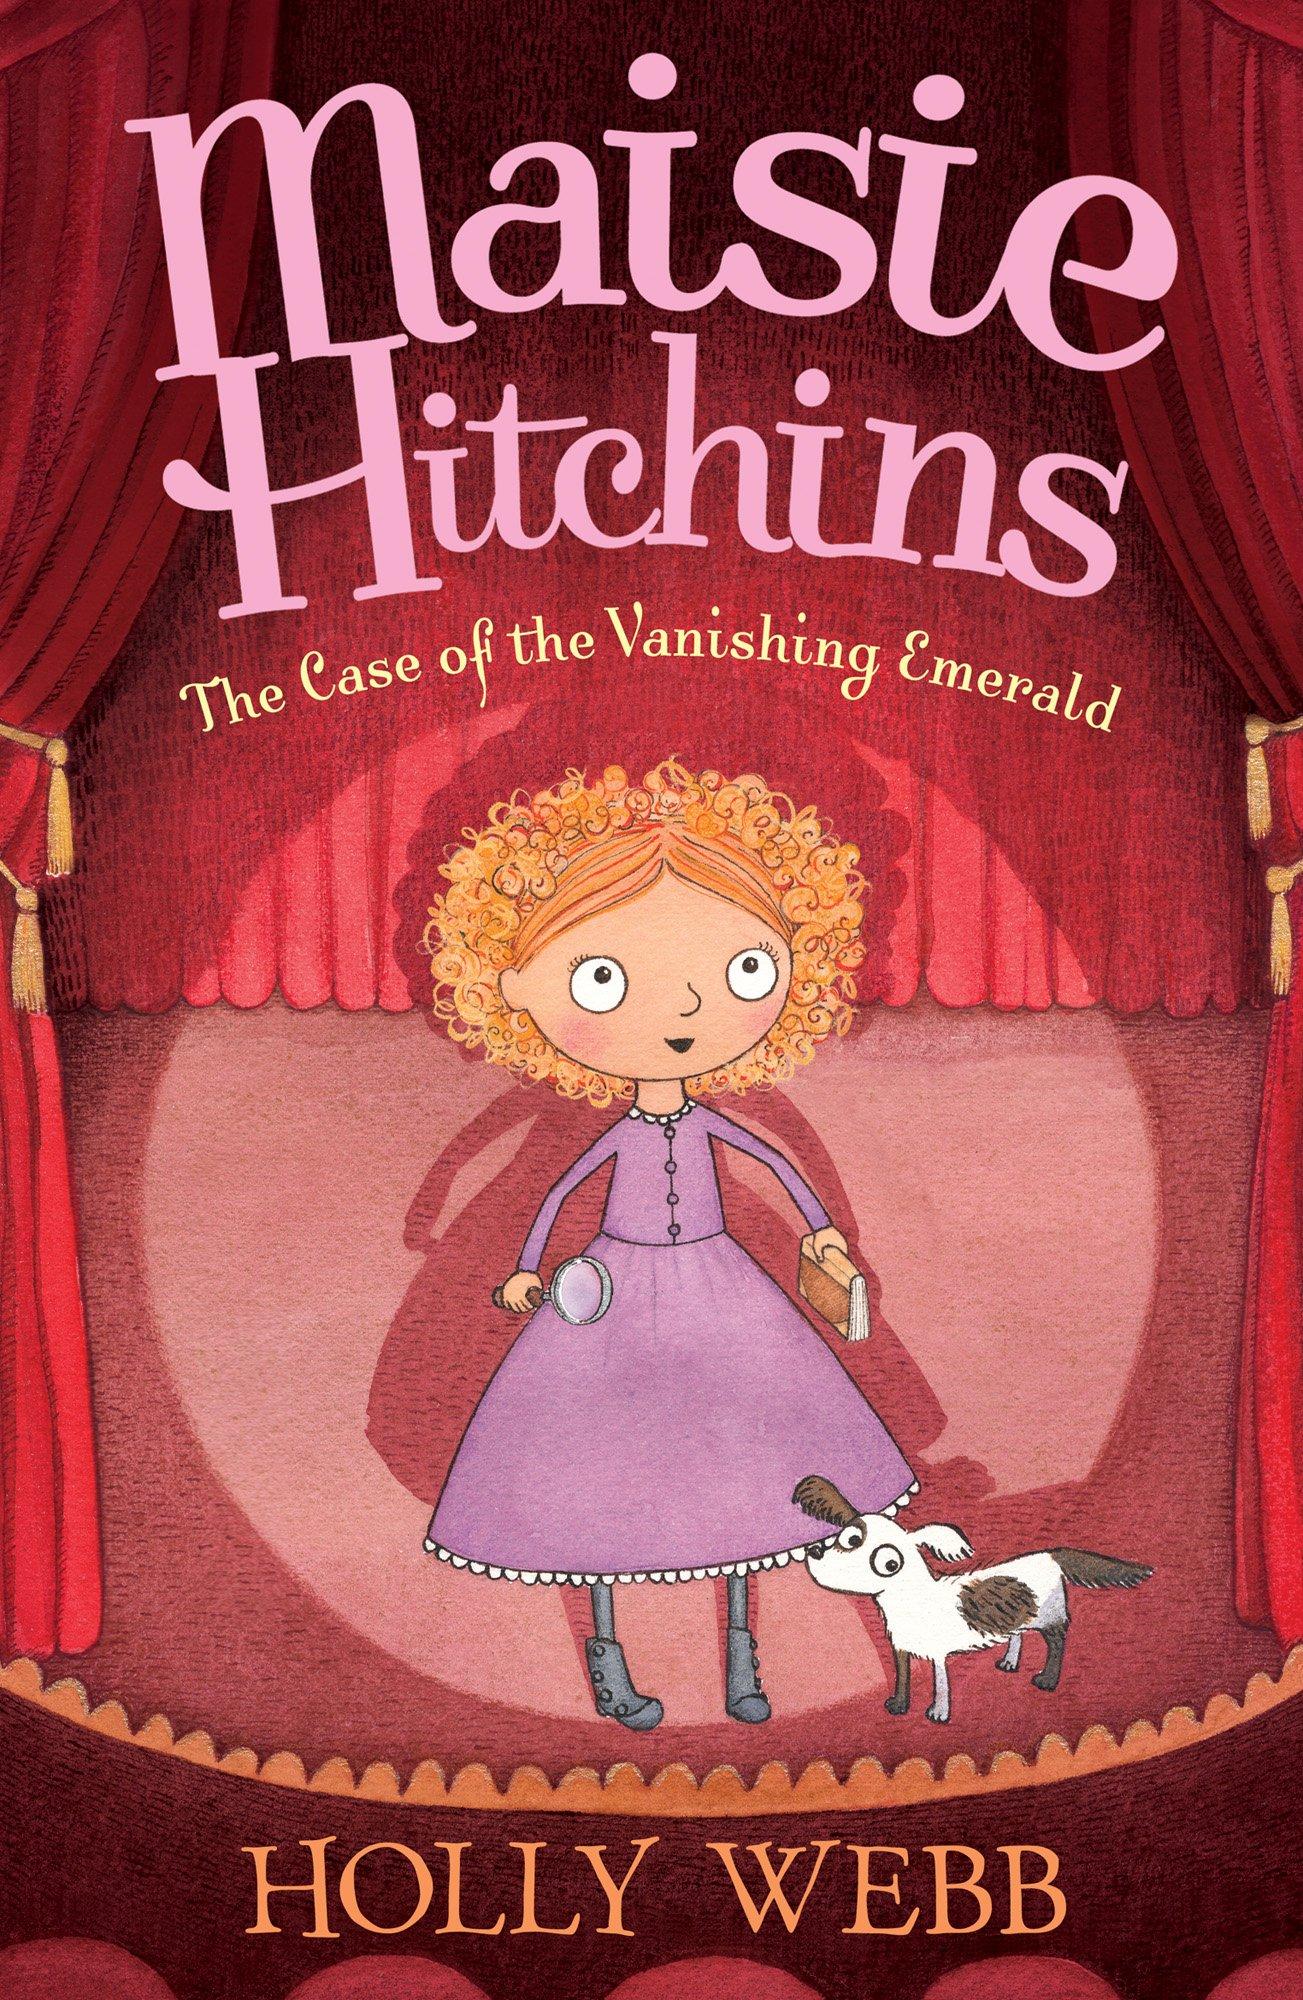 The Case of the Vanishing Emerald (Maisie Hitchins): Amazon.co.uk: Holly  Webb, Marion Lindsay: 9781847153722: Books